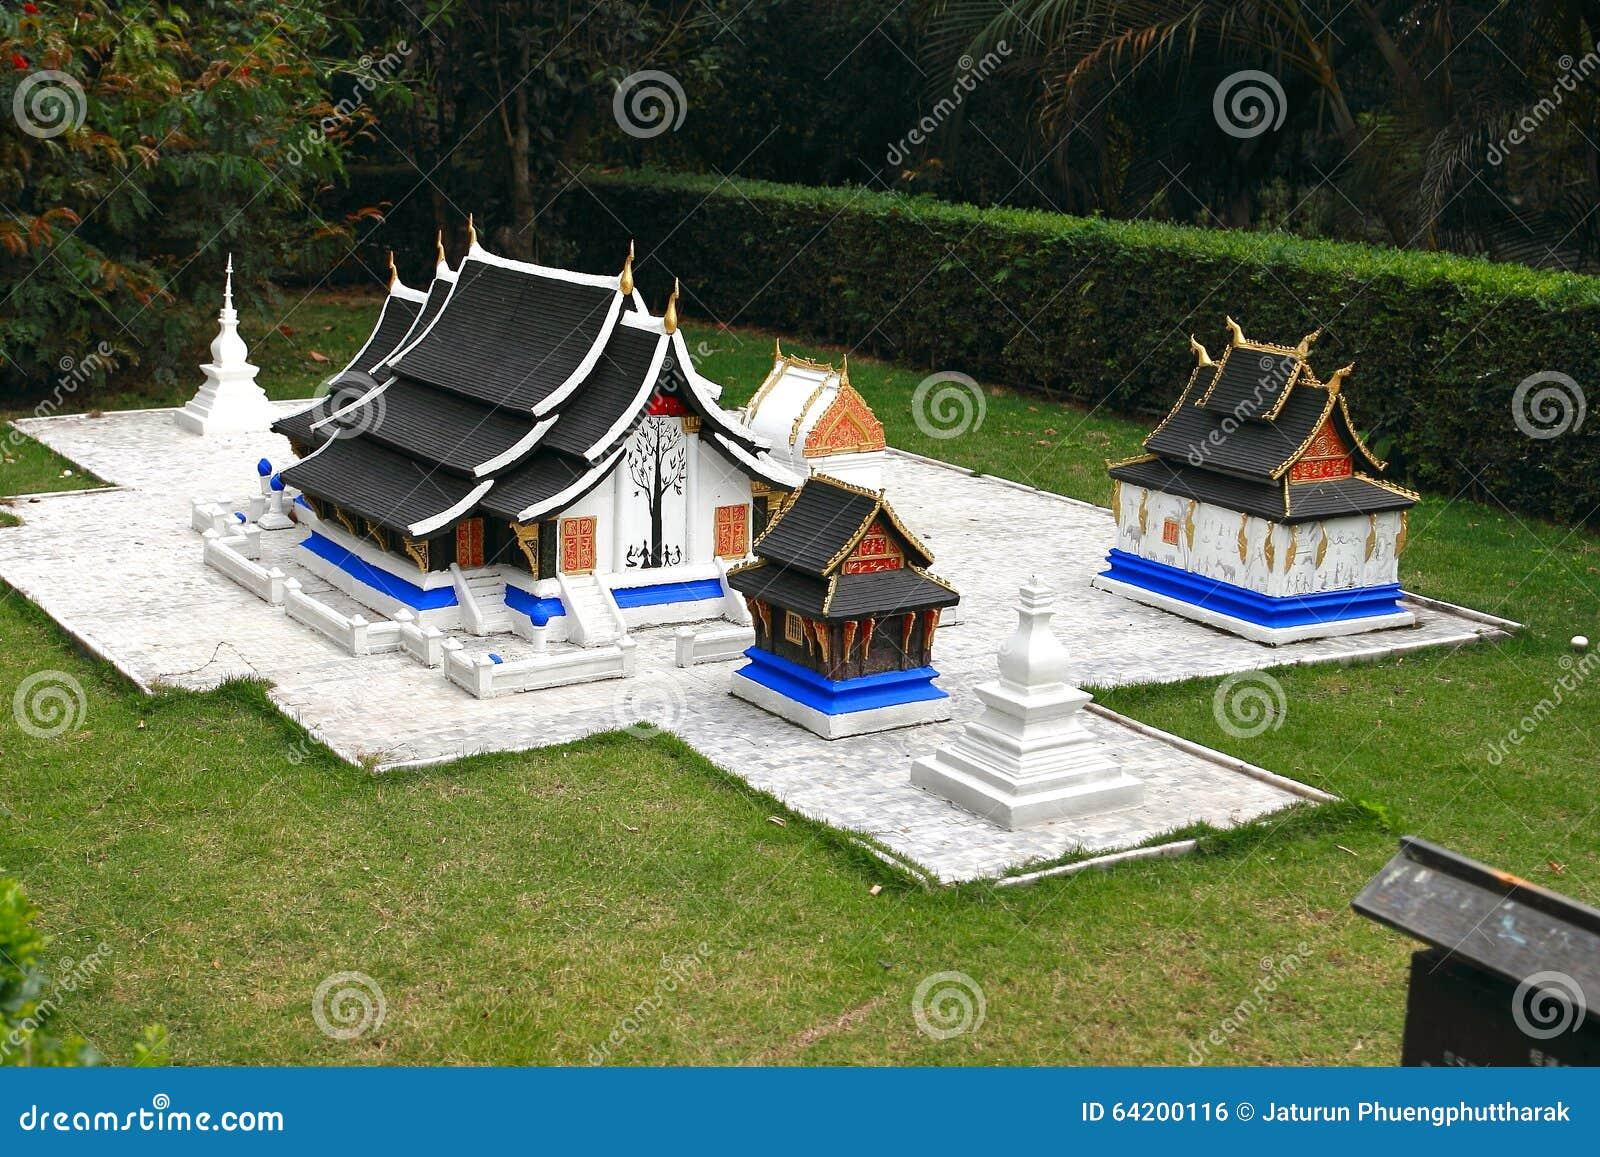 La ventana del mundo es una ciudad miniatura situada en Shenzhen, China